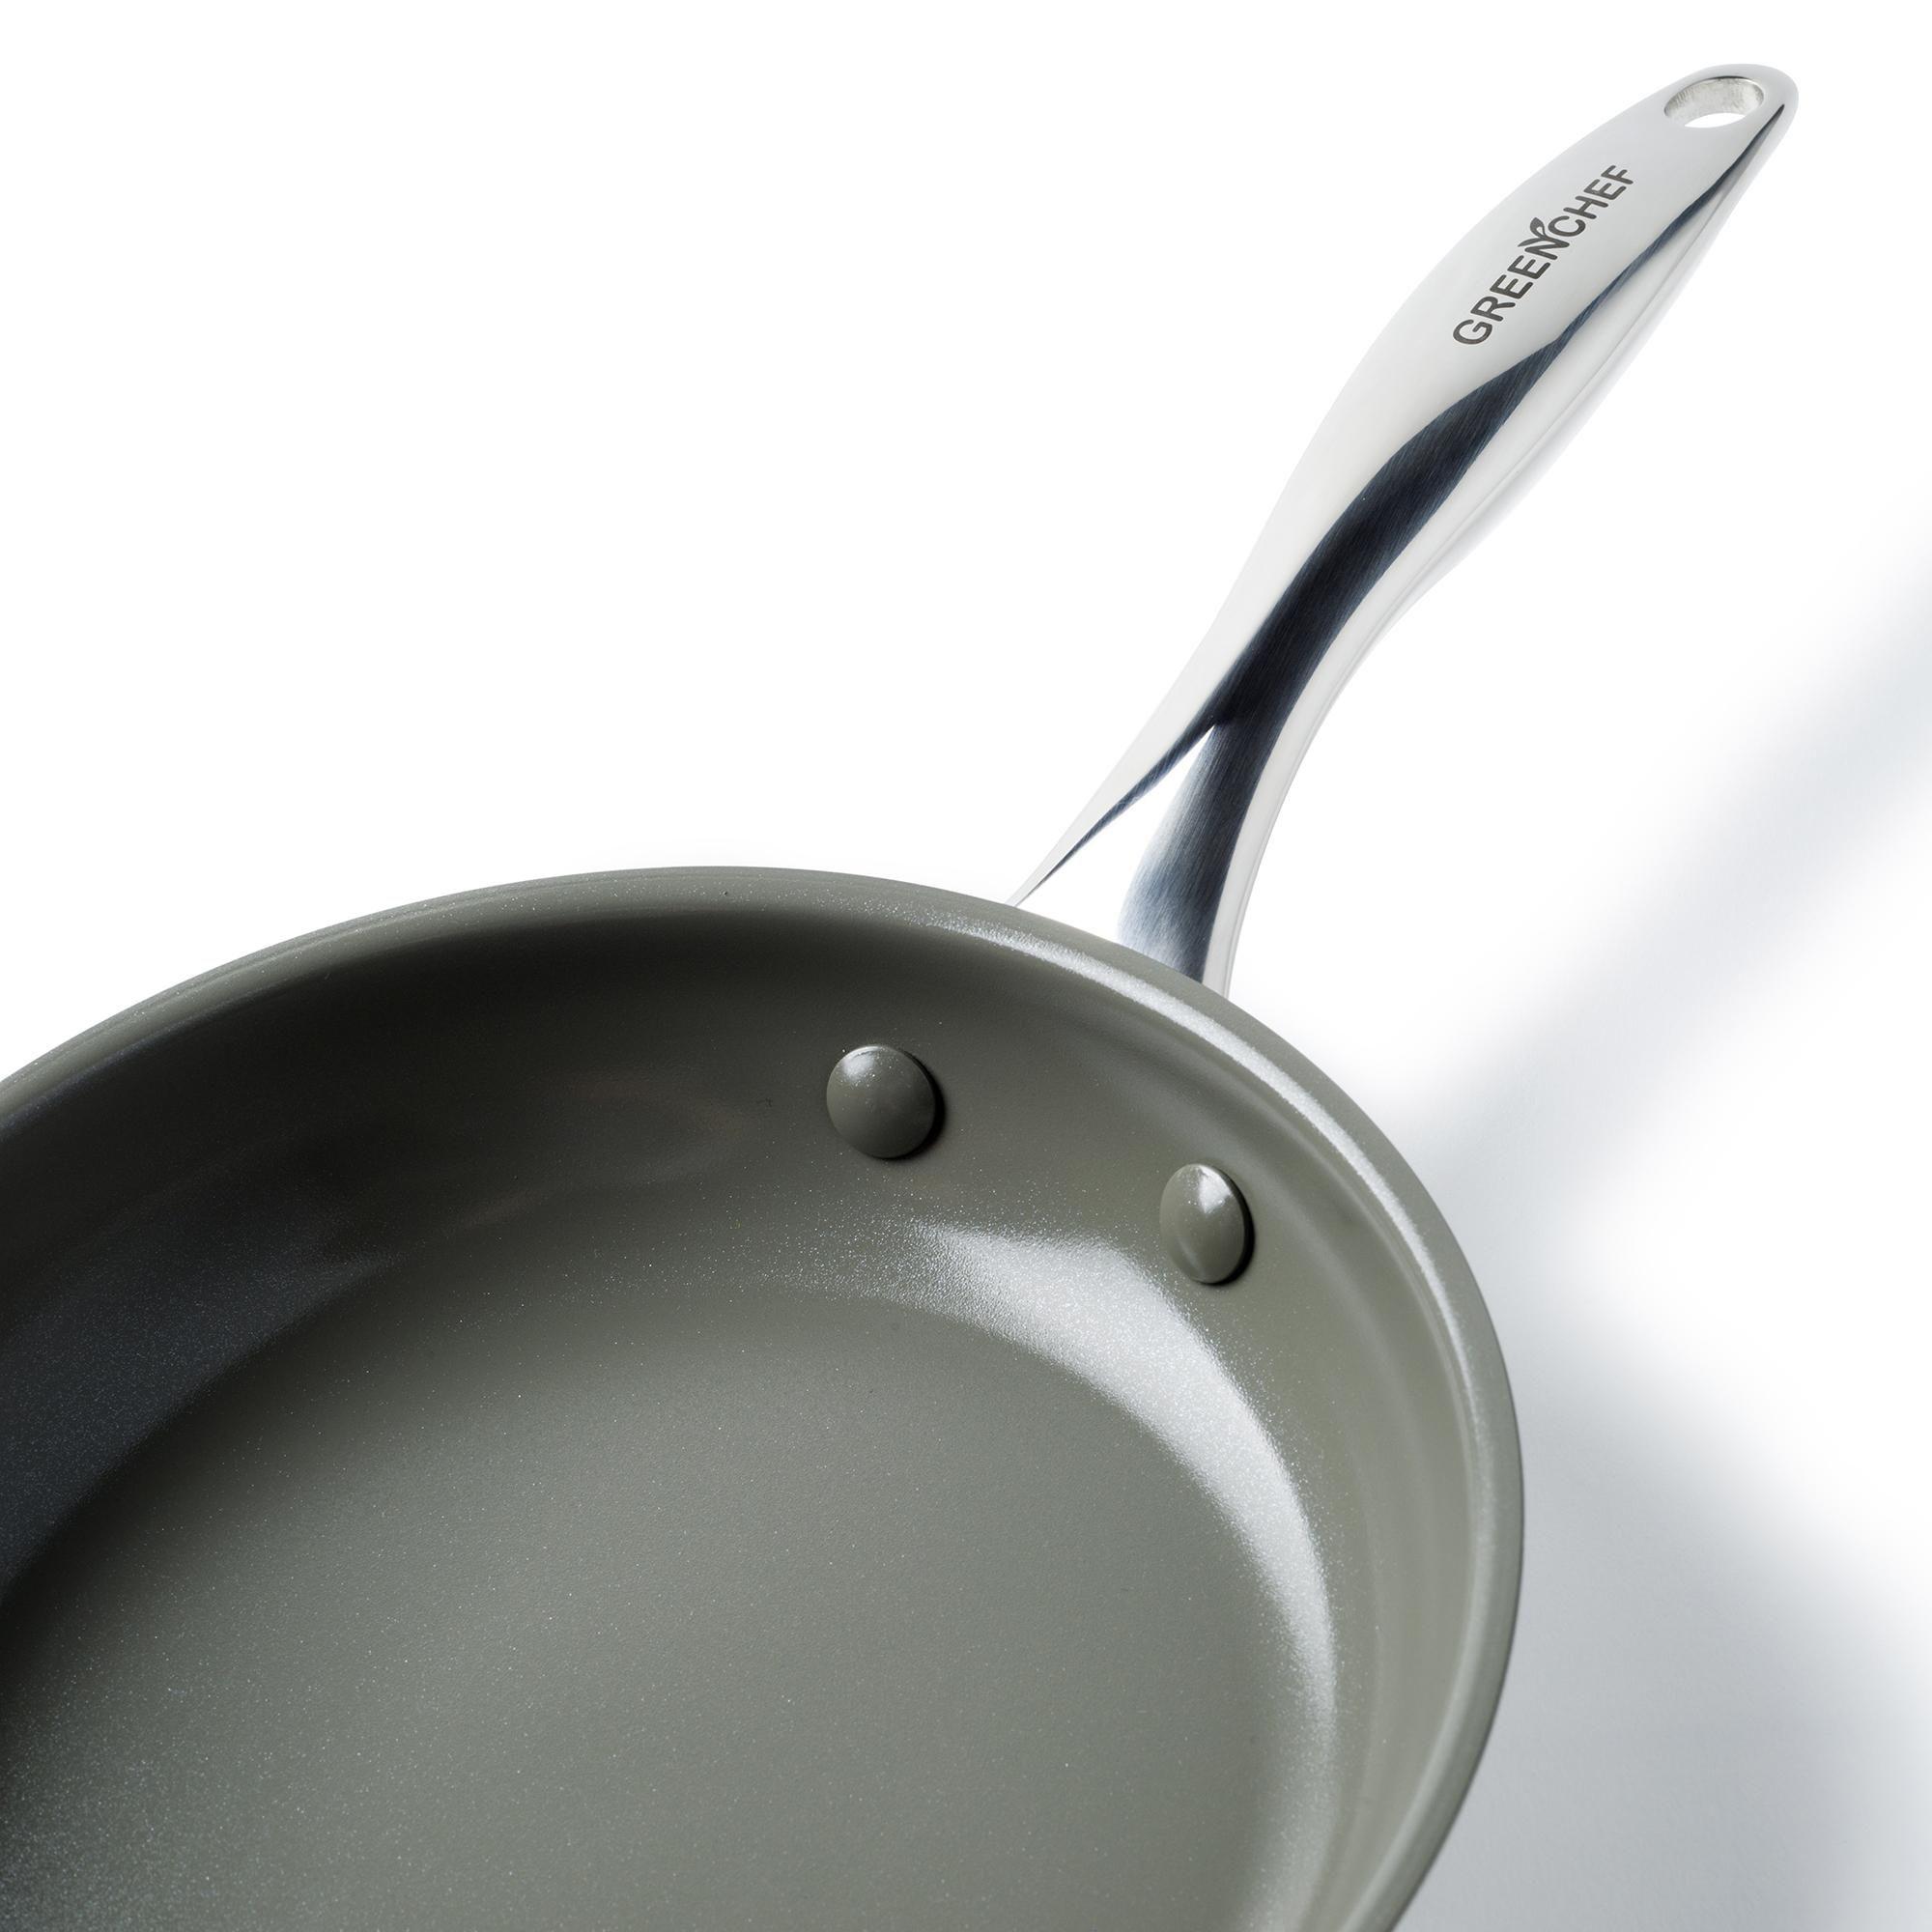 Greenchef Profile Plus Open 20cm Frying Pan In 2020 Ceramic Non Stick Pan Frying Pan